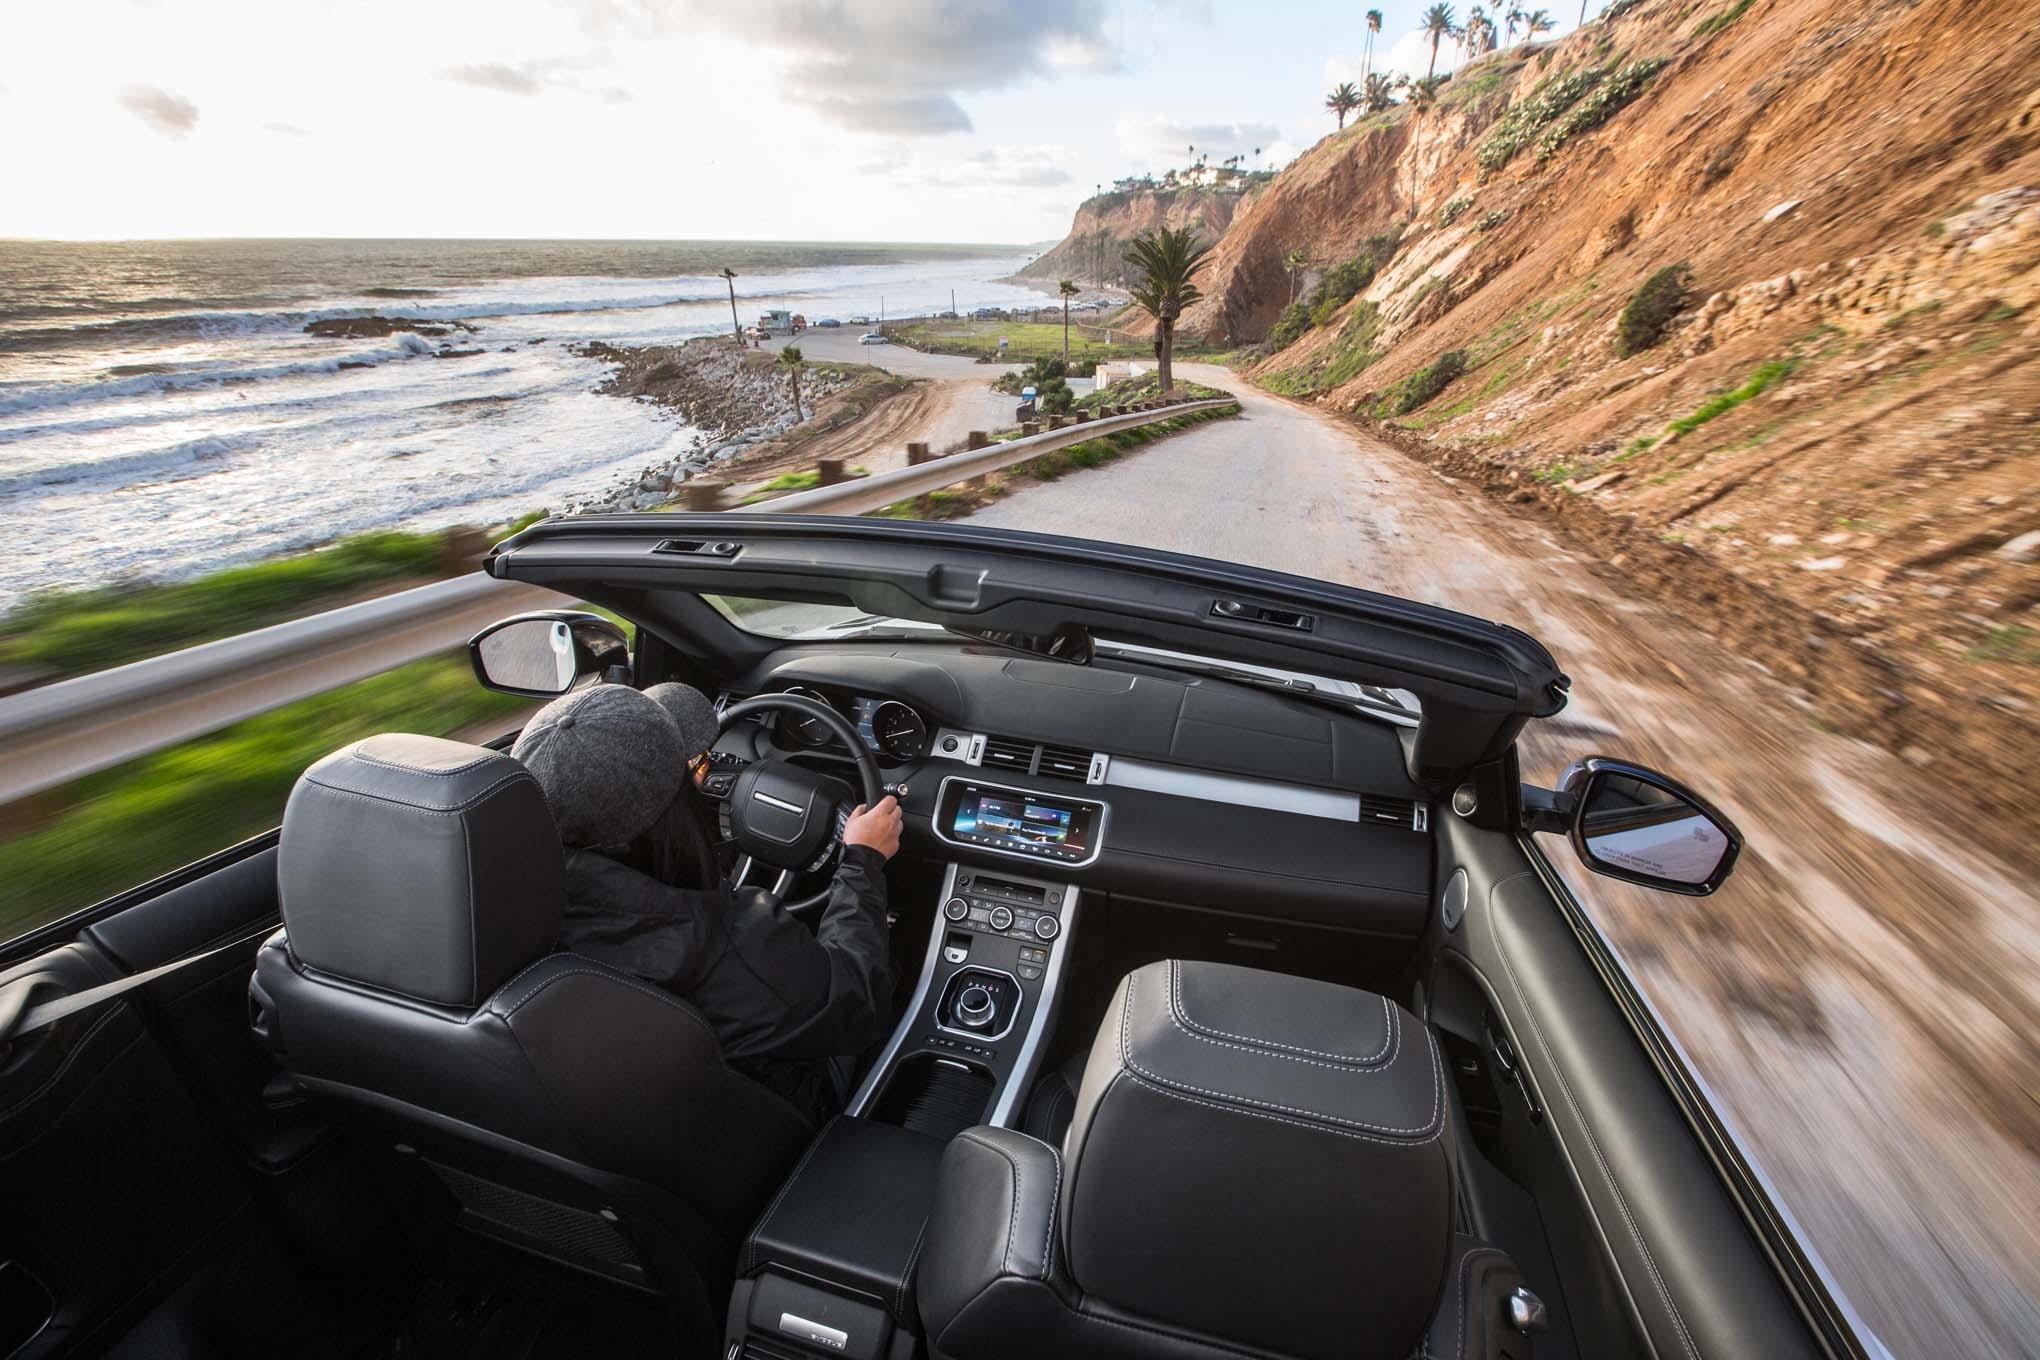 2017 Land Rover Range Rover Evoque convertible interior view in motion